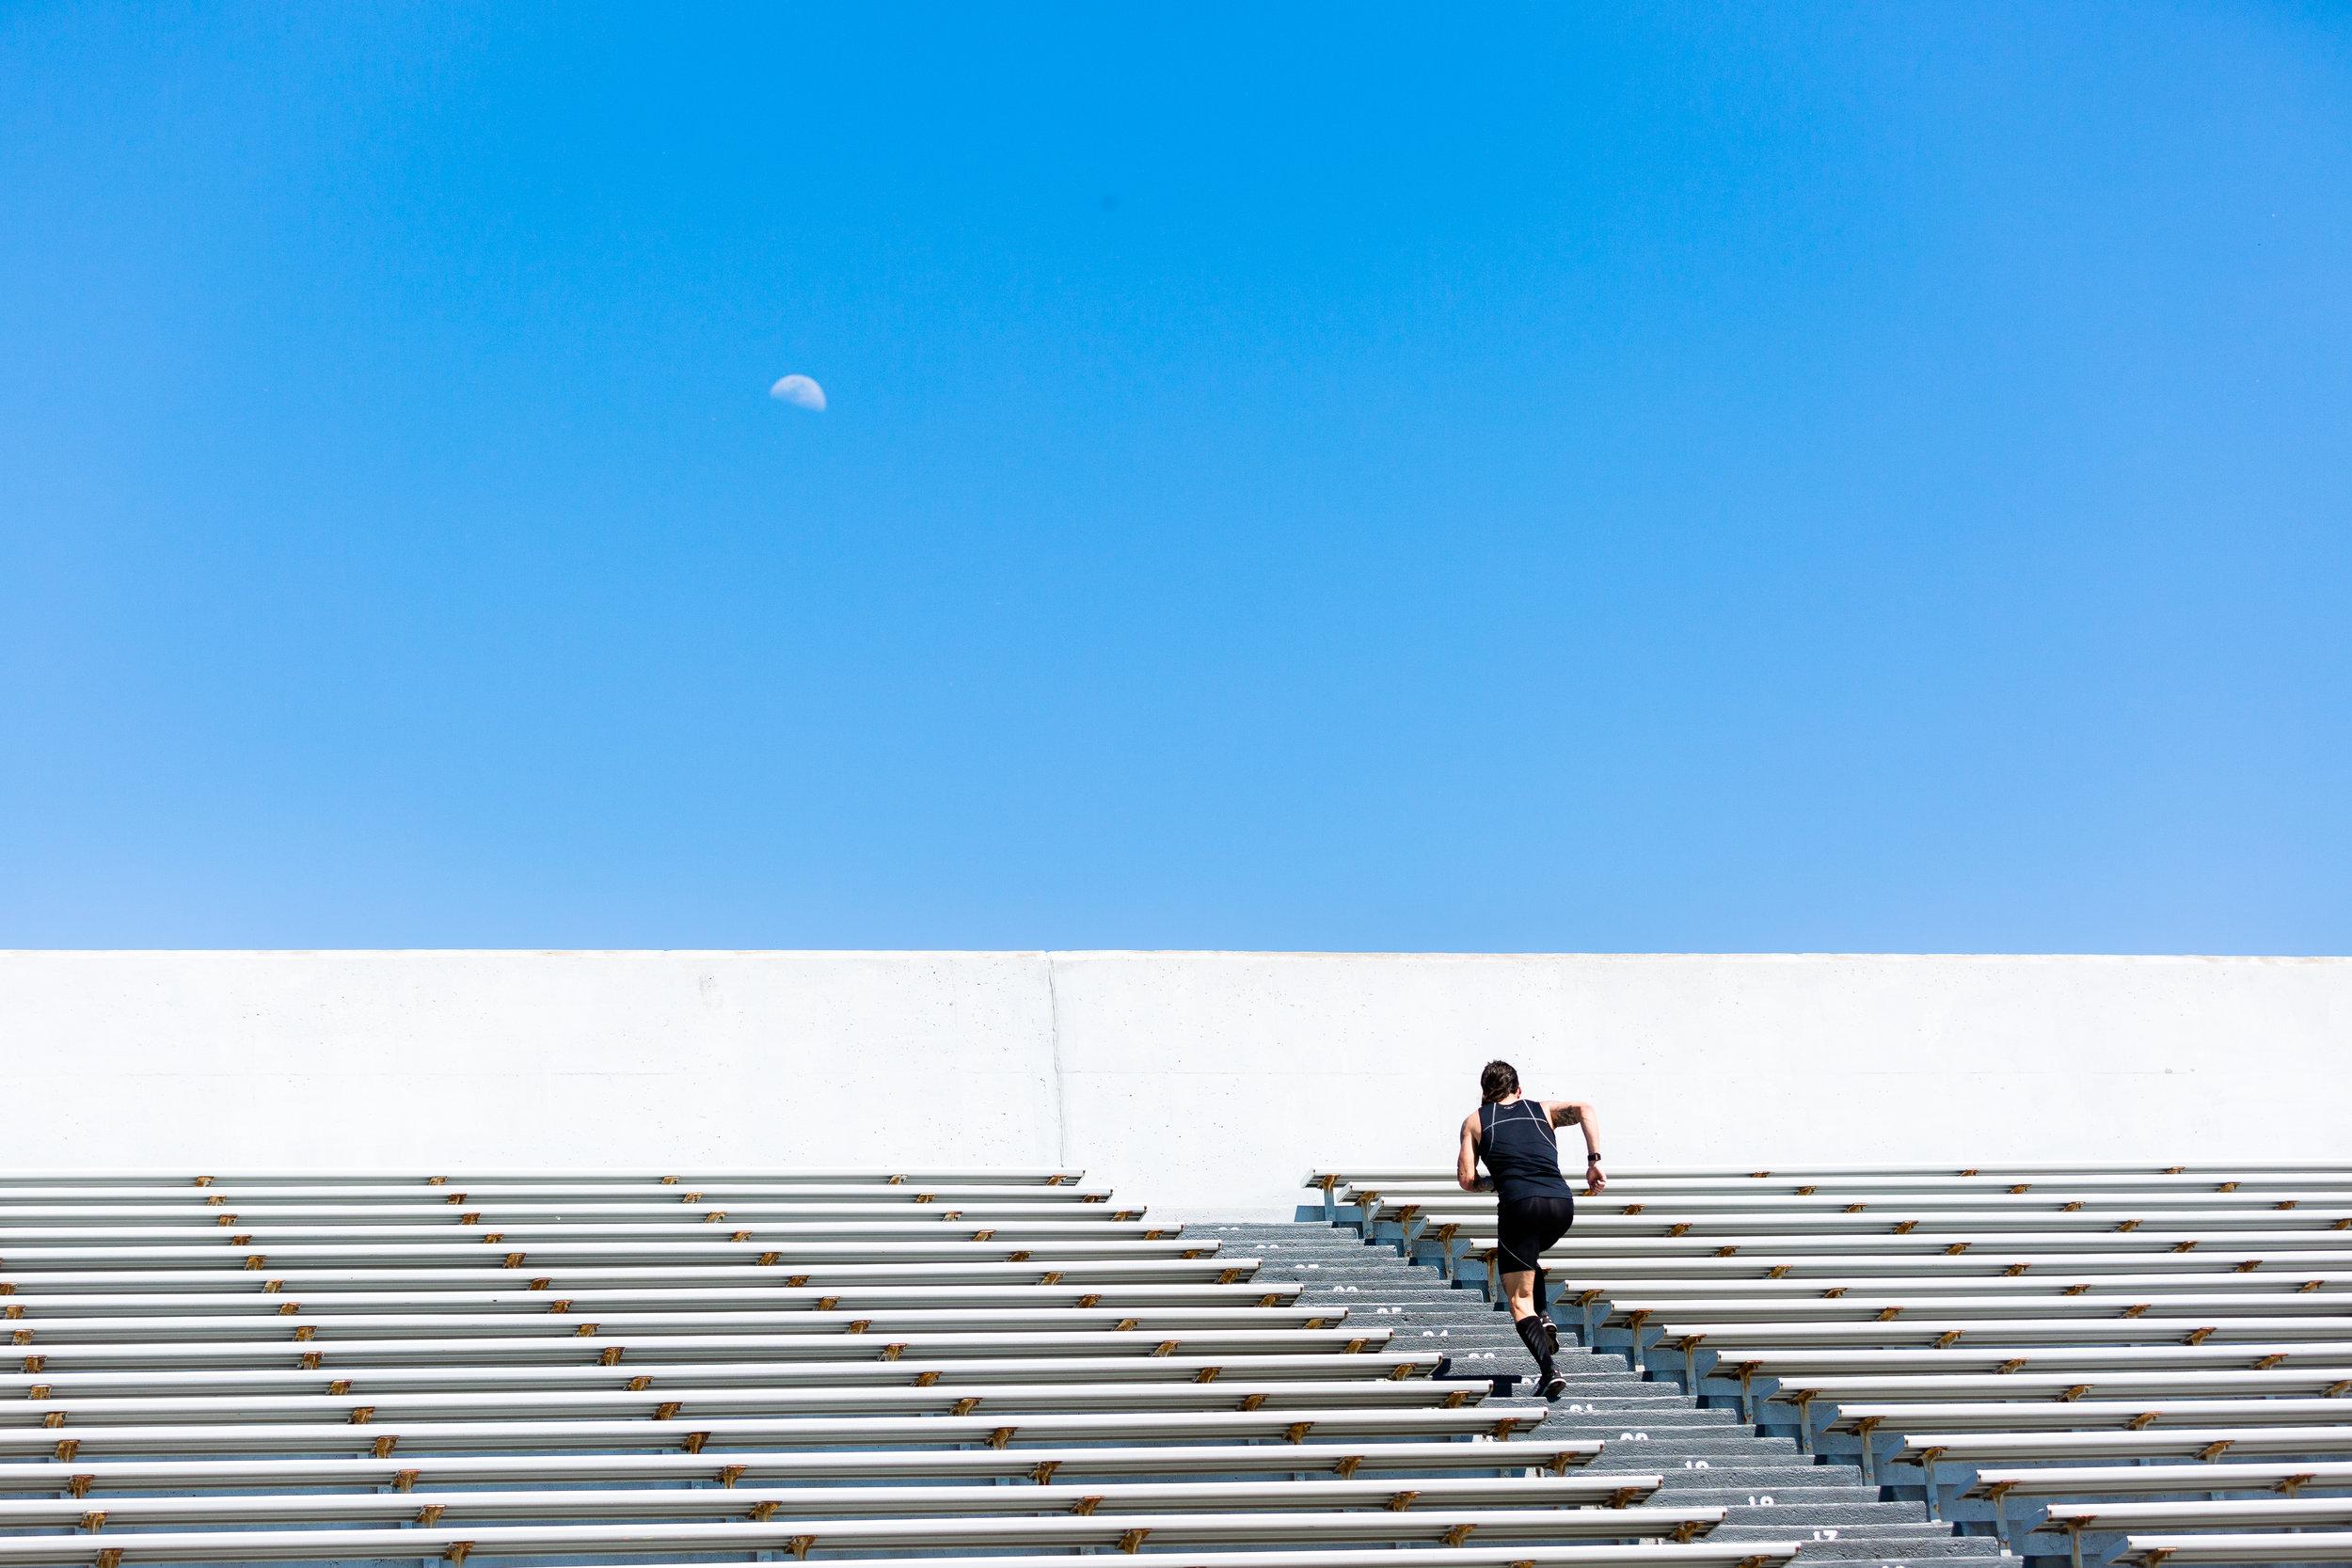 Mullet Man aka Kyle Dietz runs towards the moon in Davenport, IA.